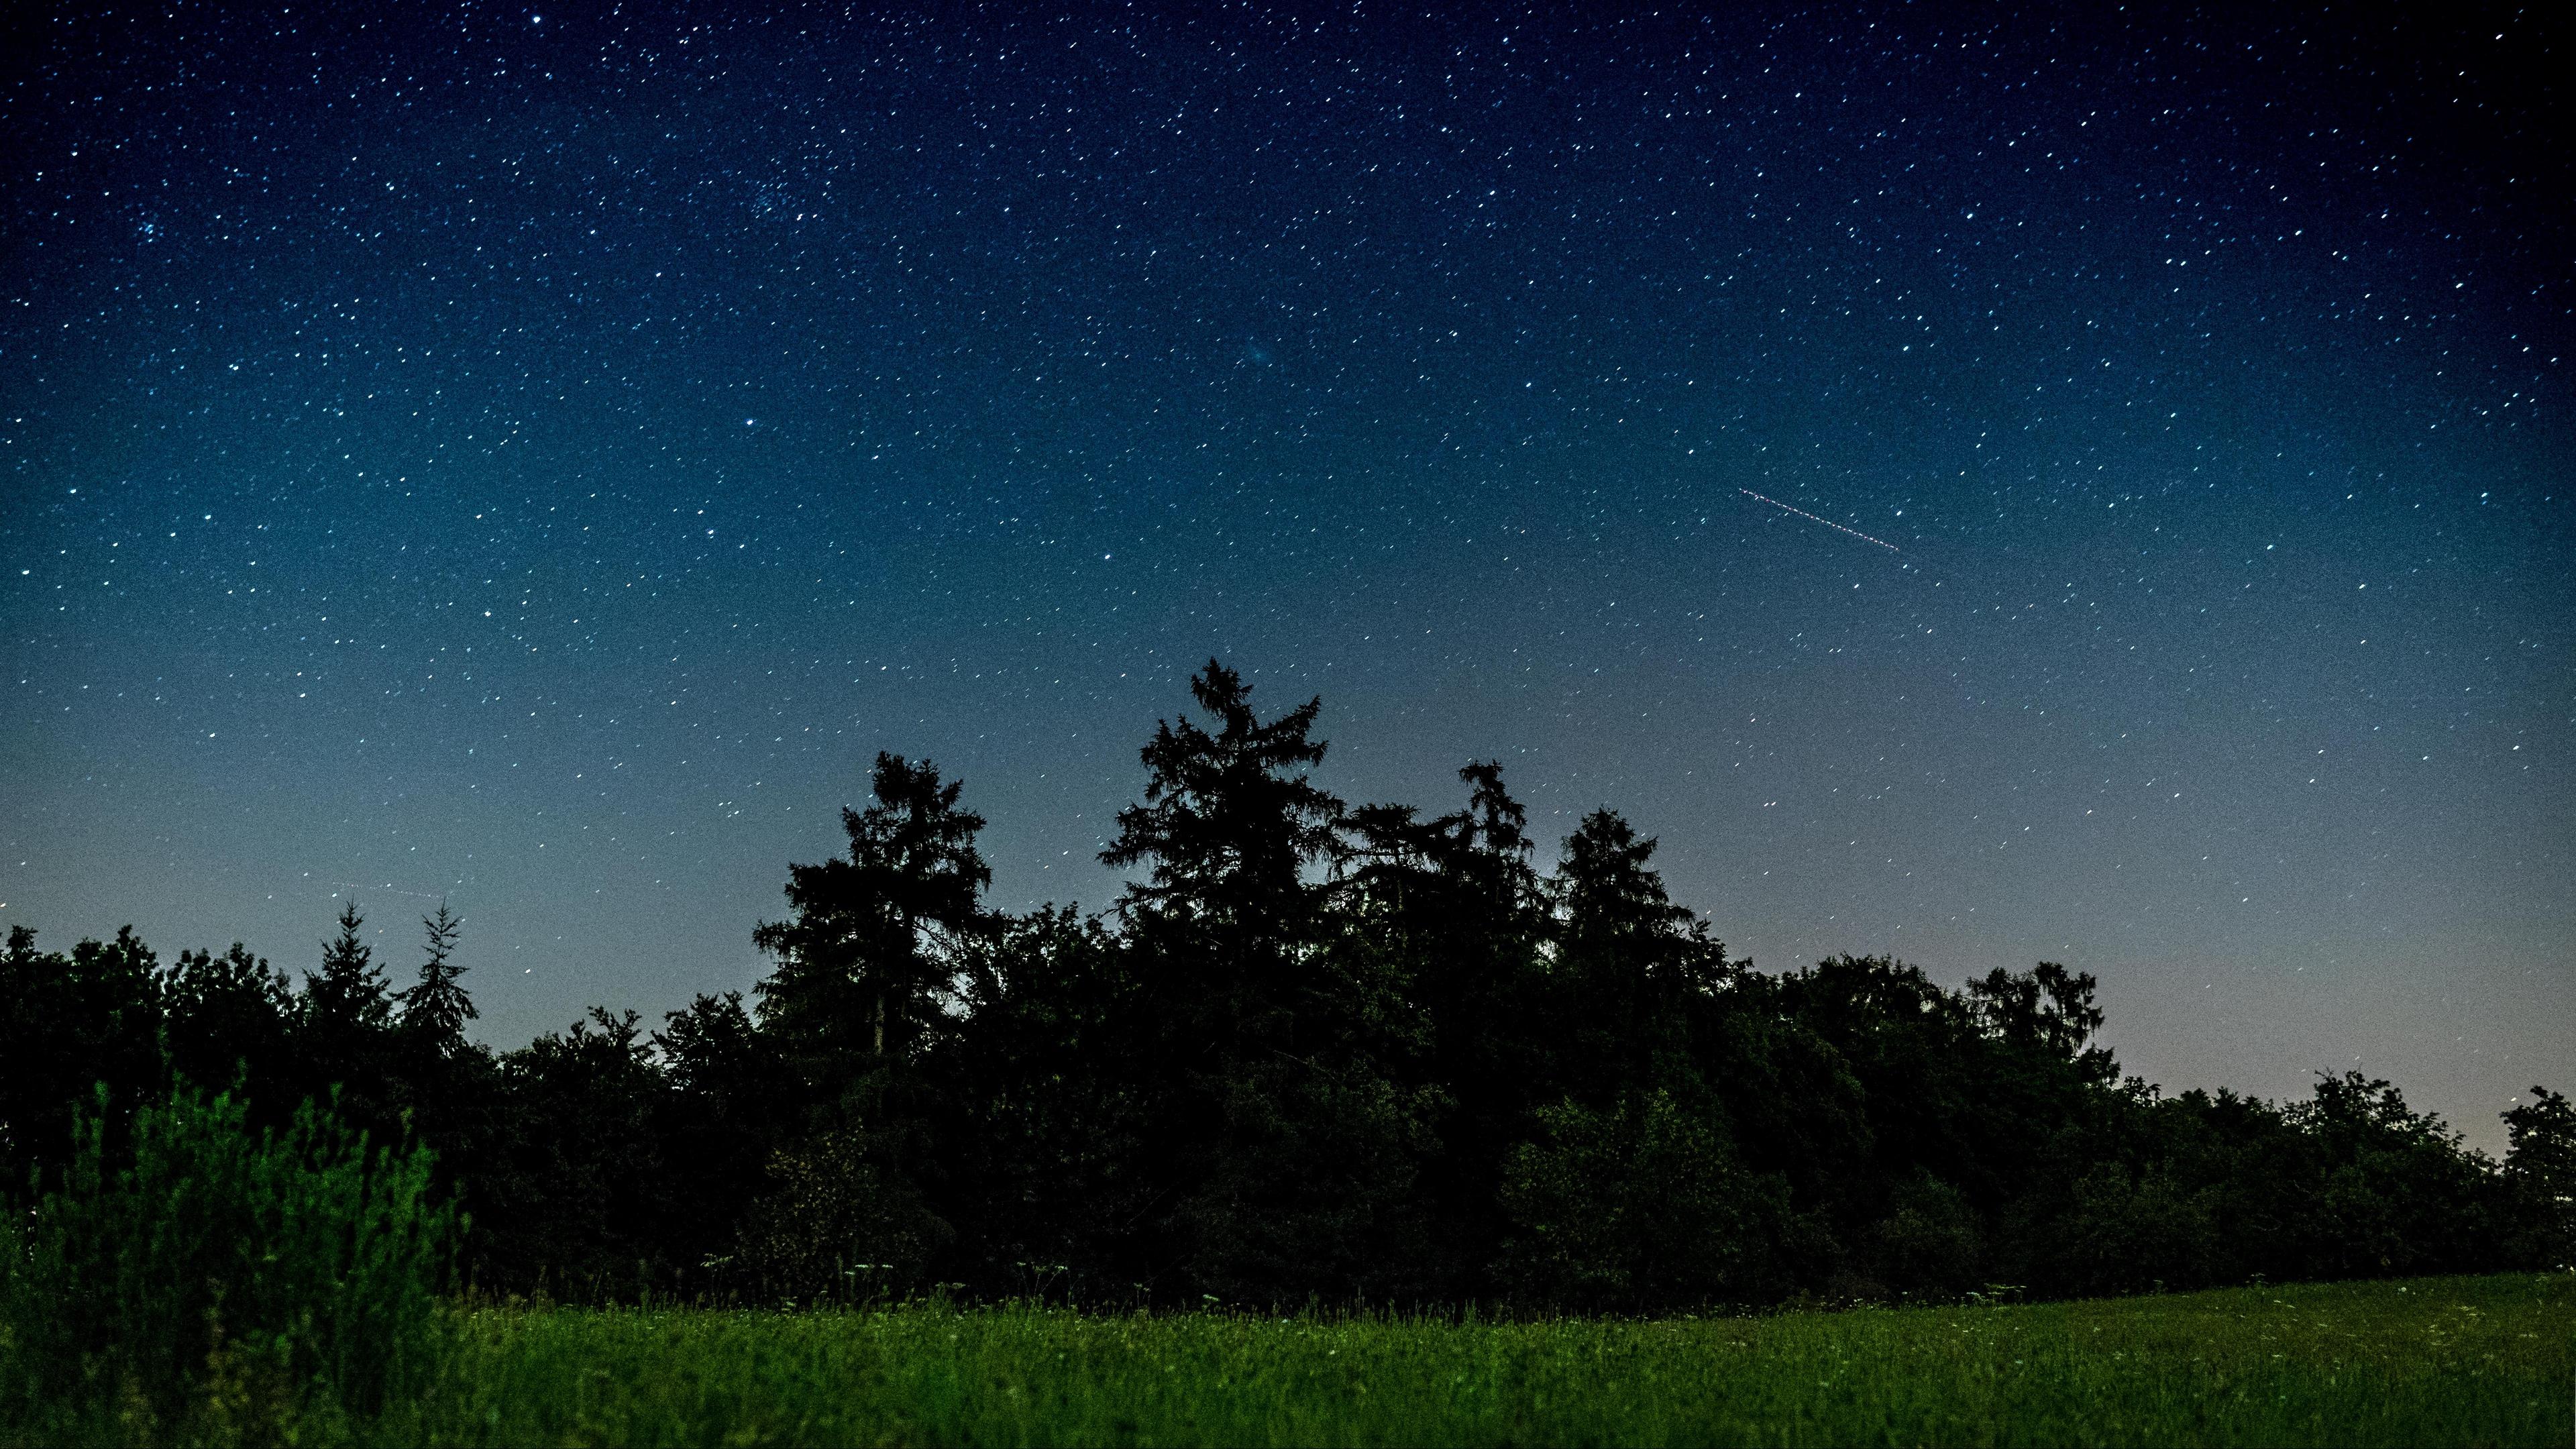 starry sky trees night field 4k 1541115460 - starry sky, trees, night, field 4k - Trees, starry sky, Night